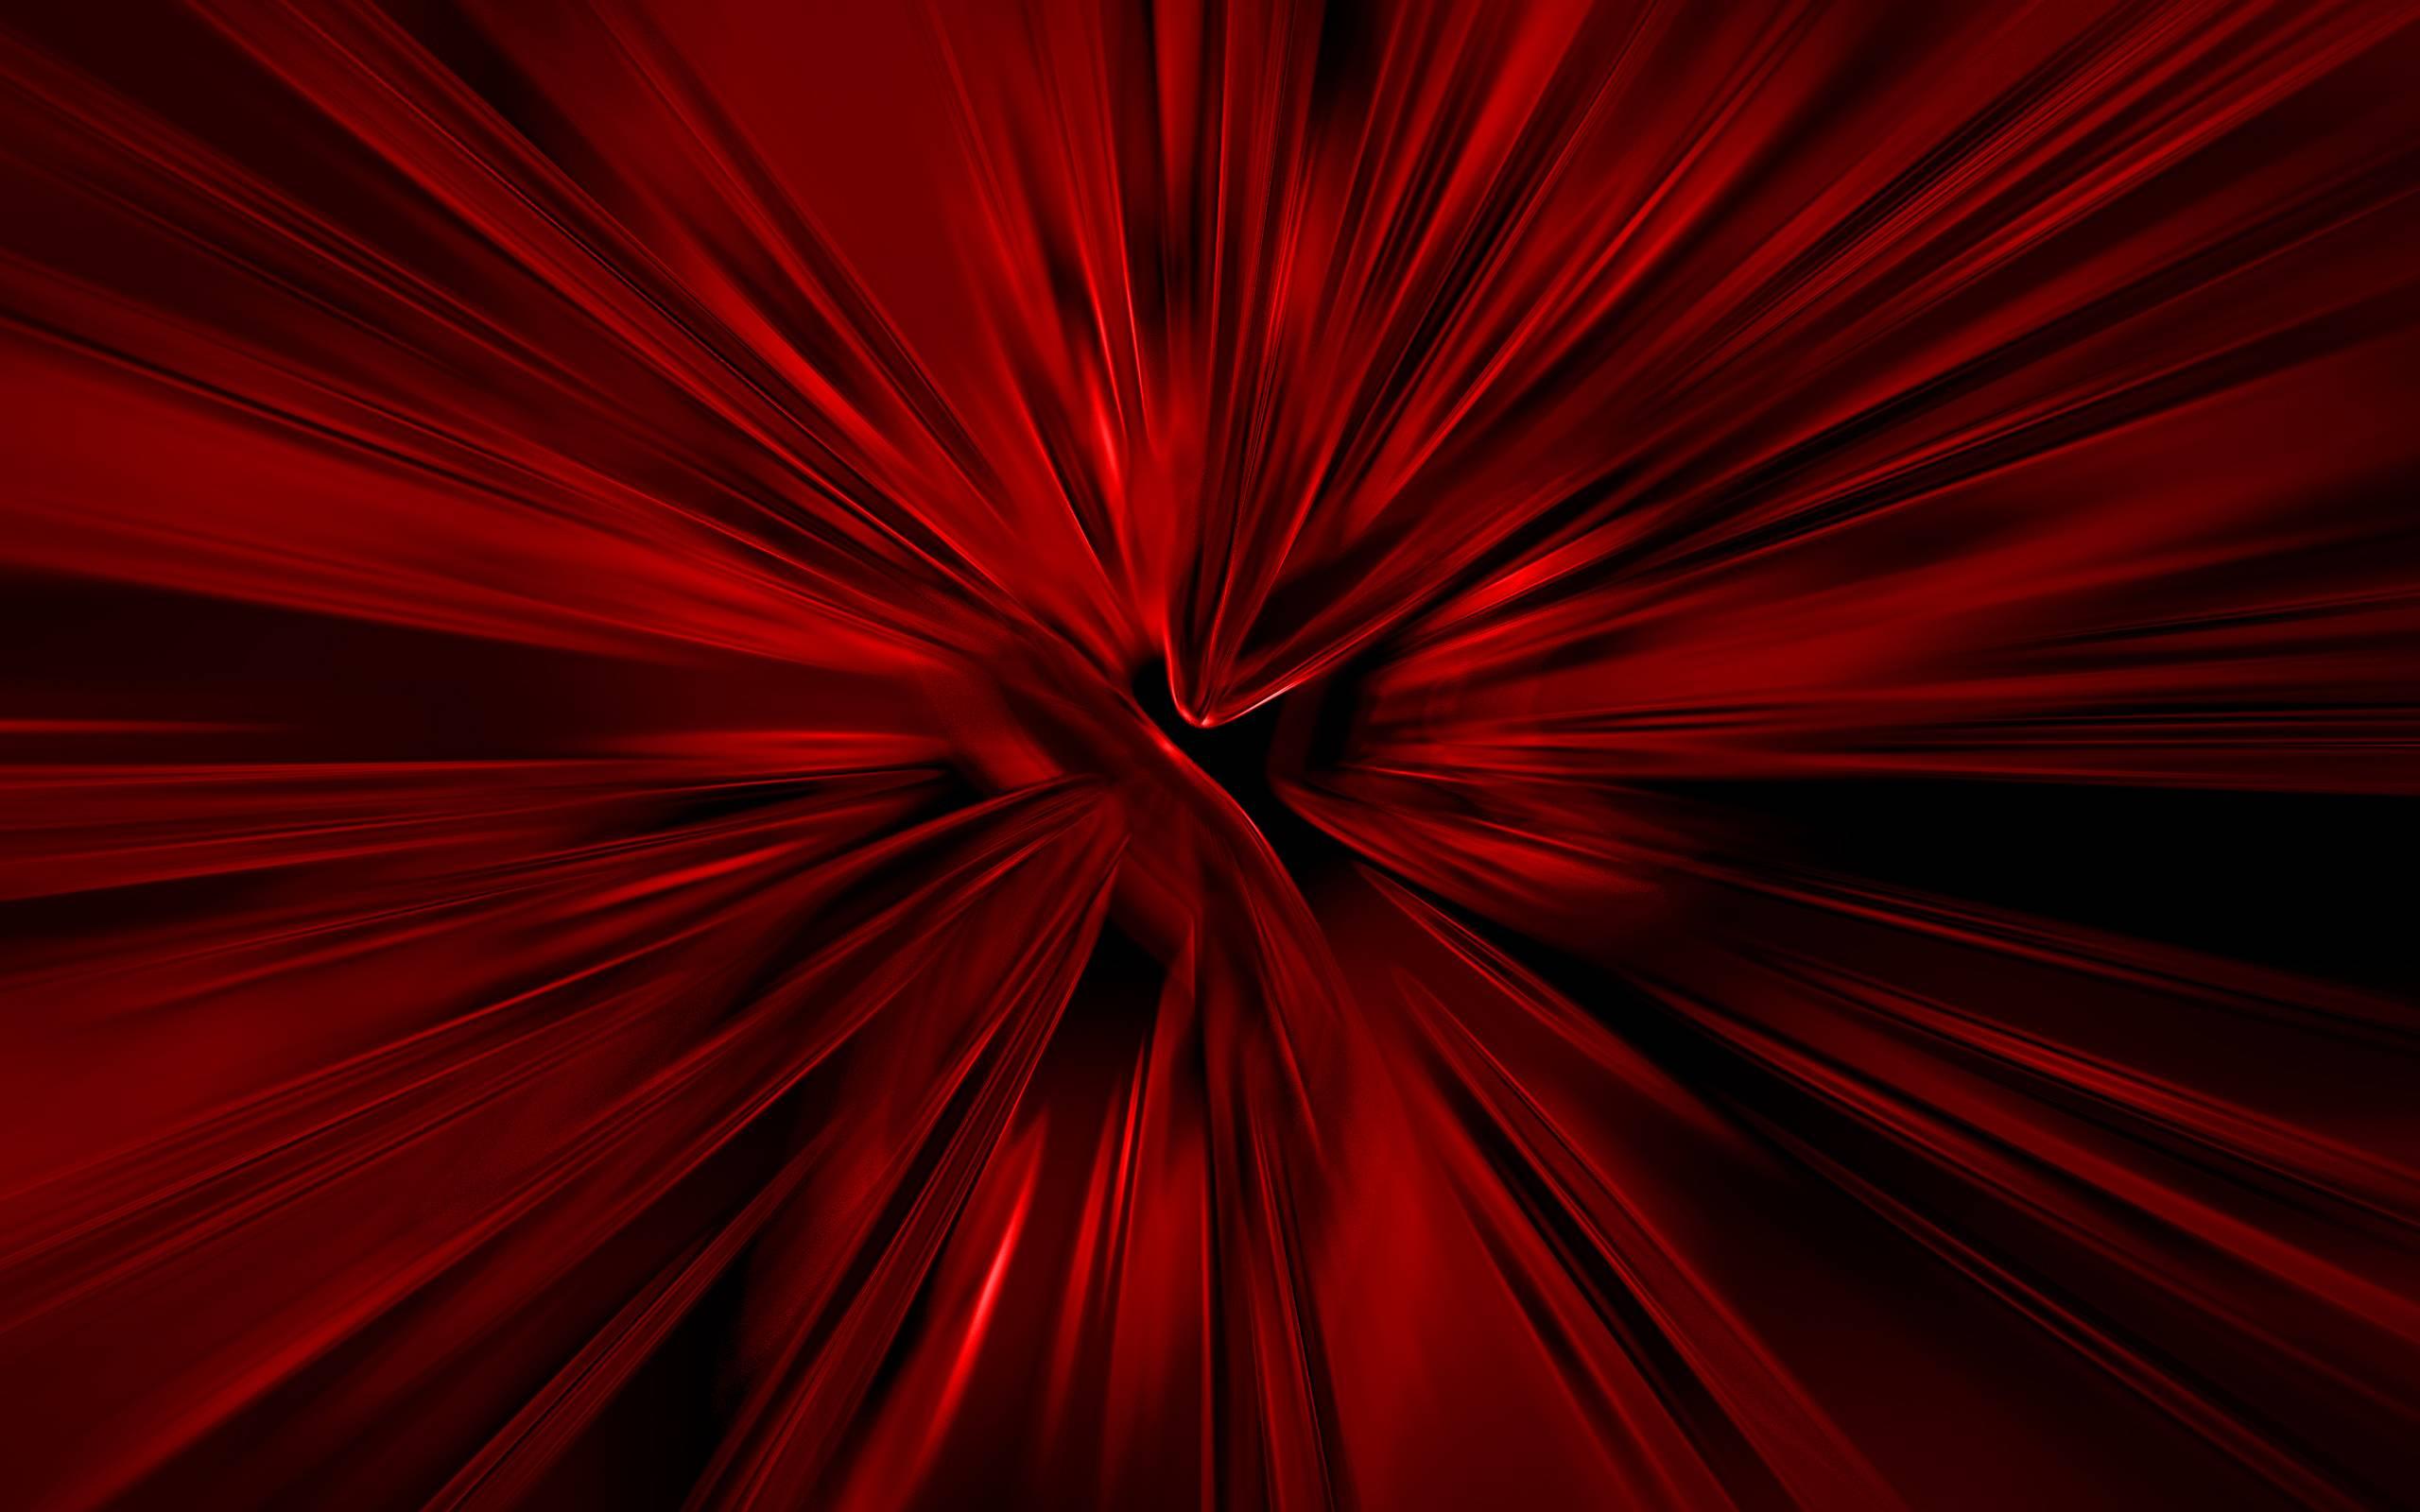 Red And Black Desktop Wallpapers Top Free Red And Black Desktop